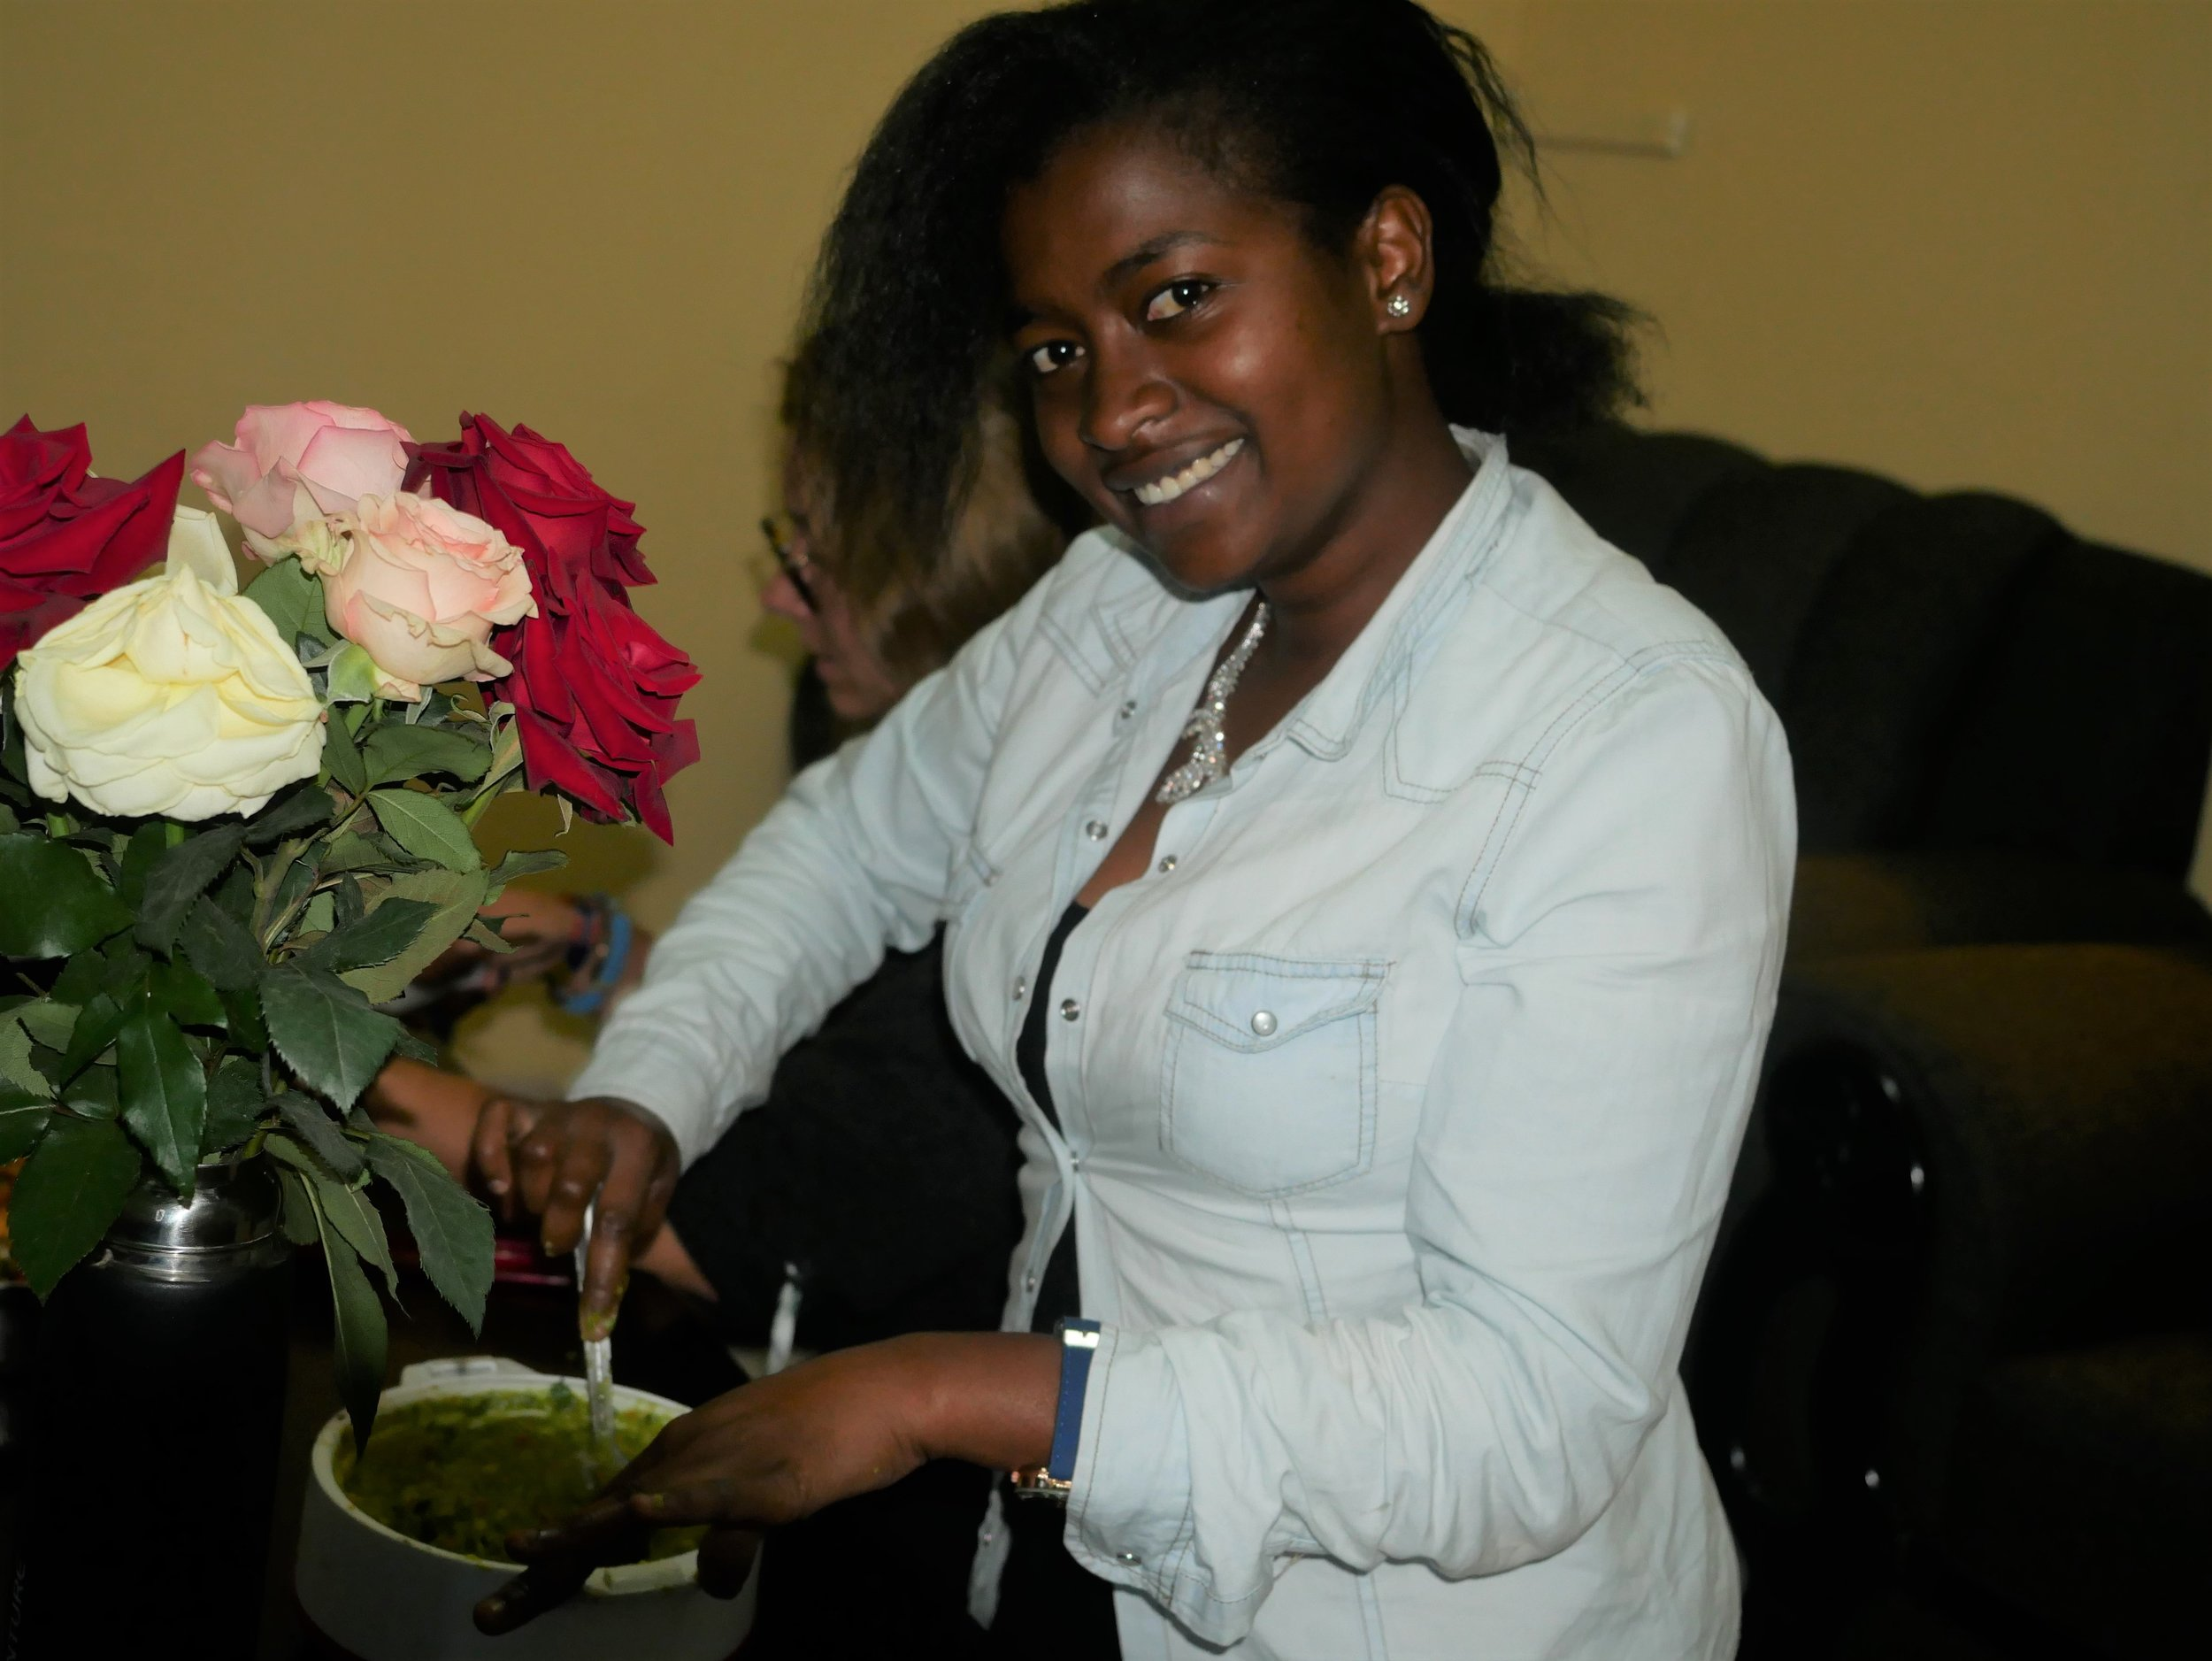 BYC member Winnie Kamau. Photo: Elfi Thrane Bemelmans.